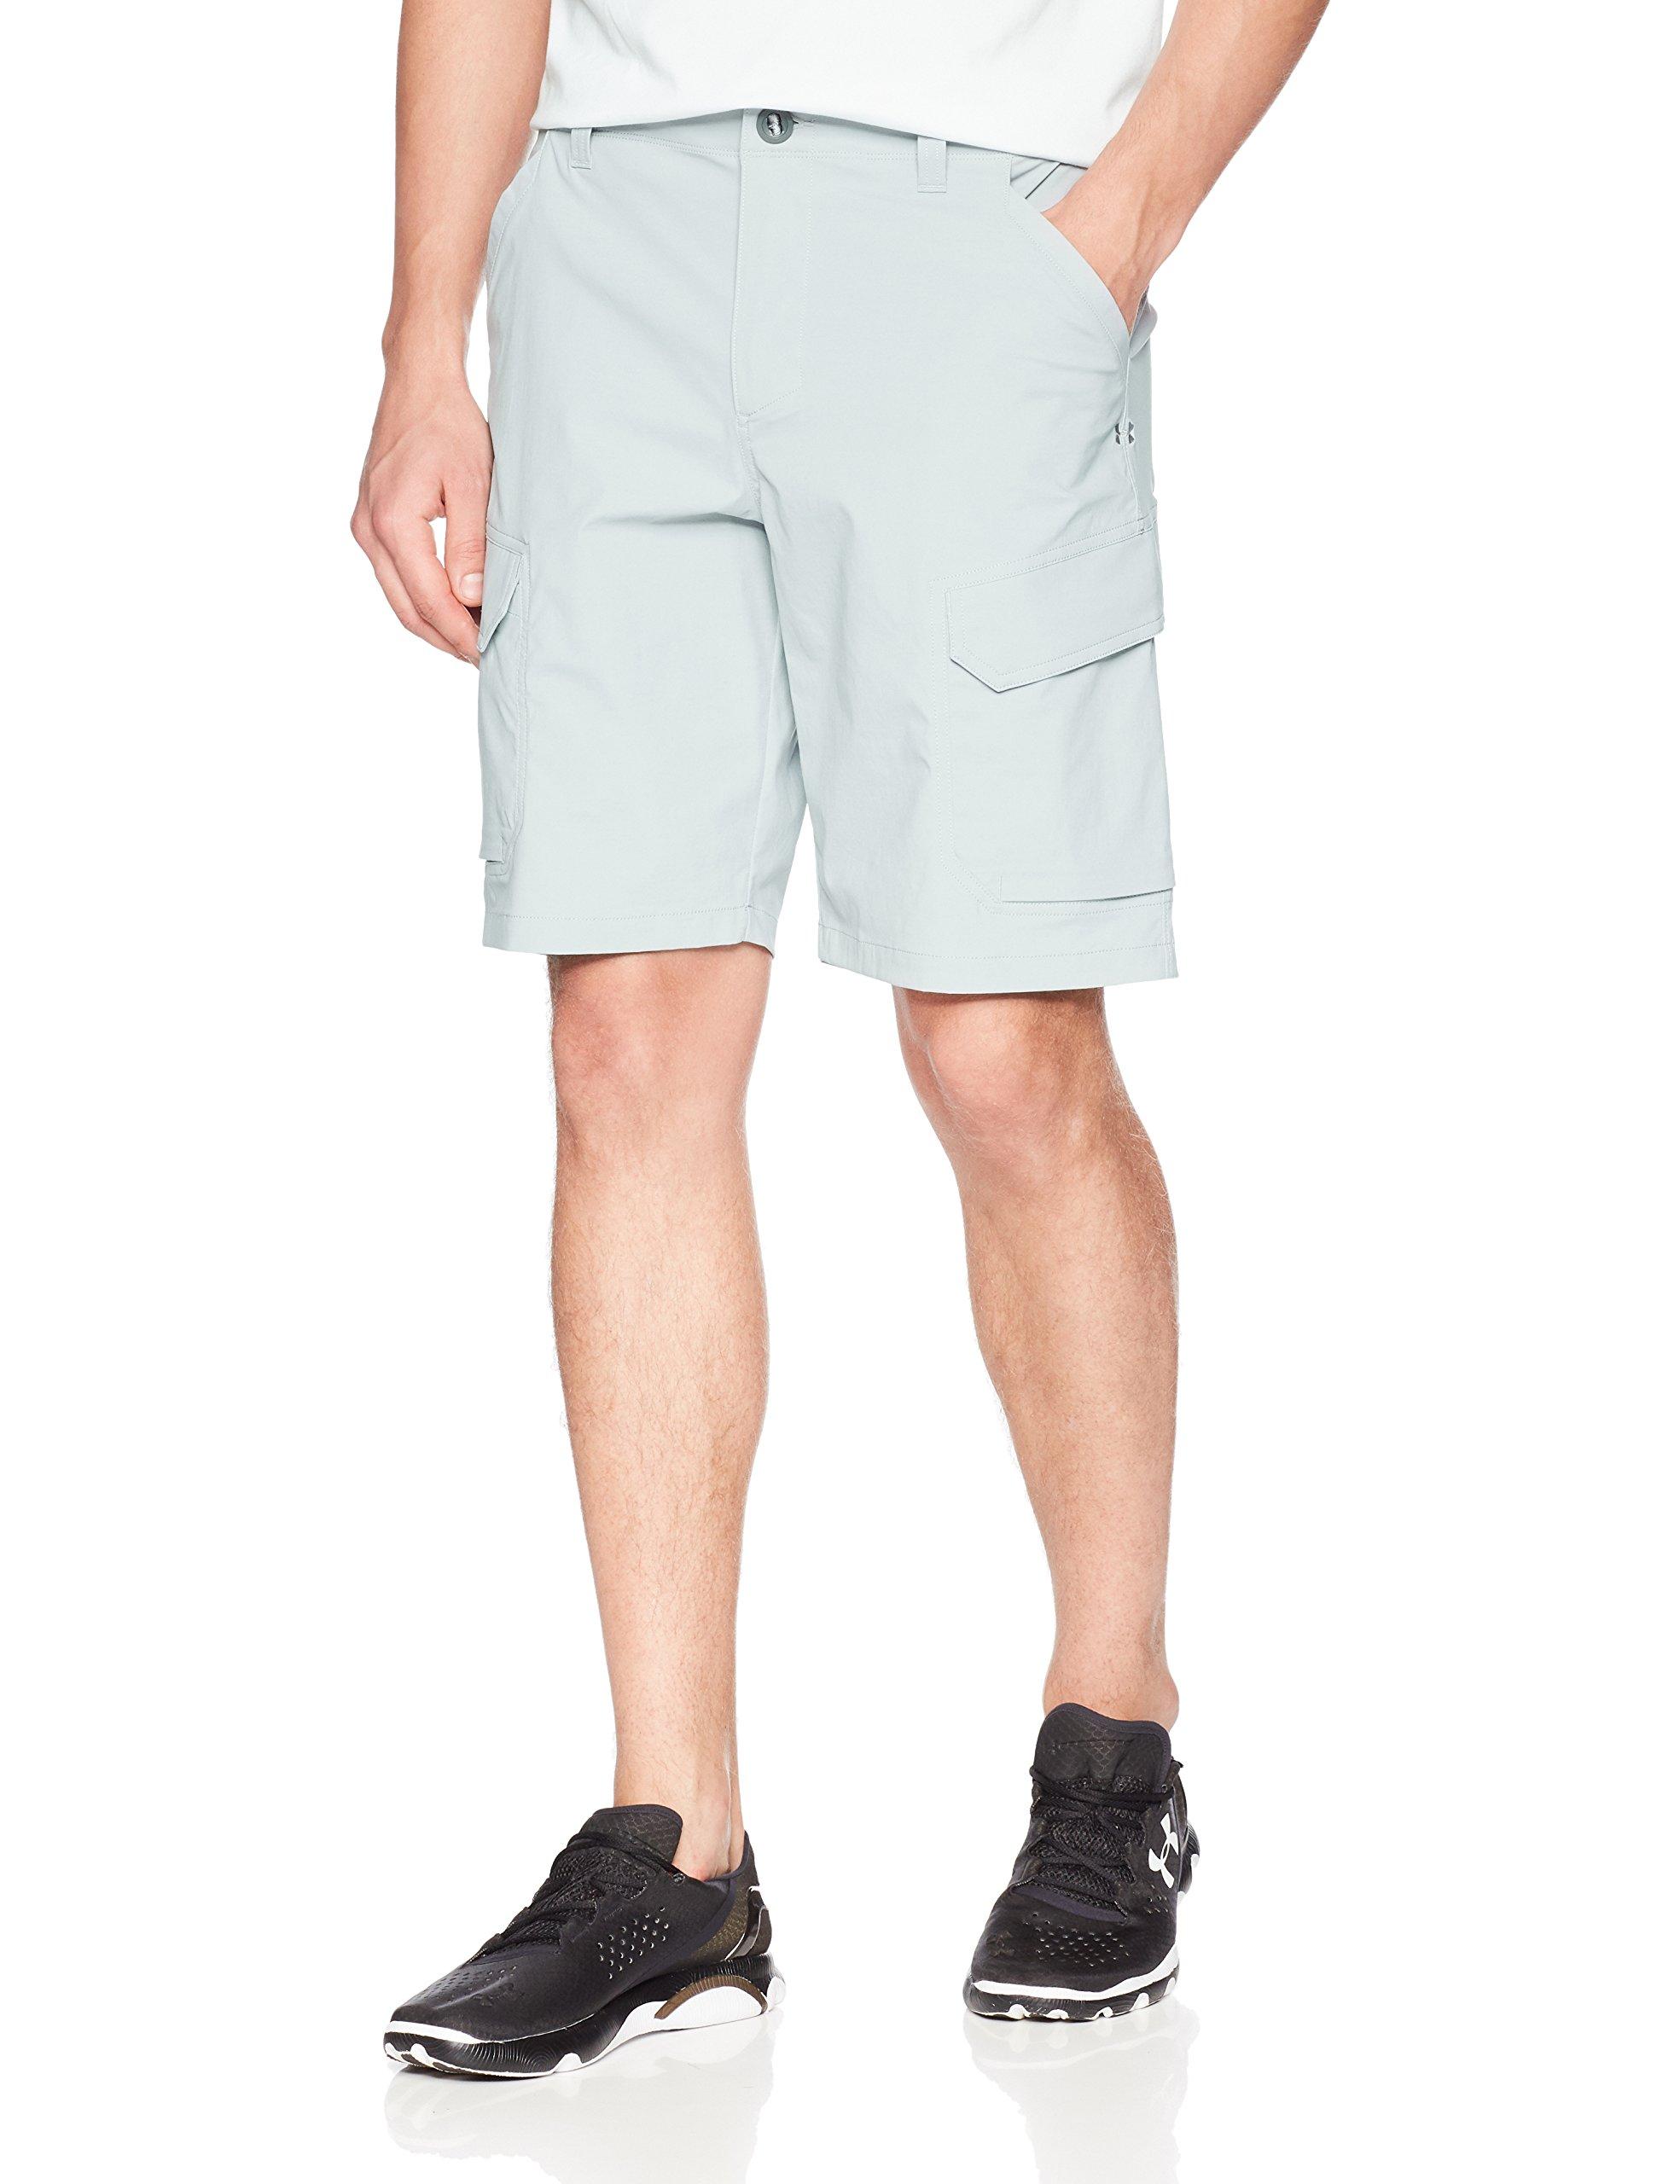 Under Armour Men's Fish Hunter Cargo Shorts, Overcast Gray/Overcast Gray, 38